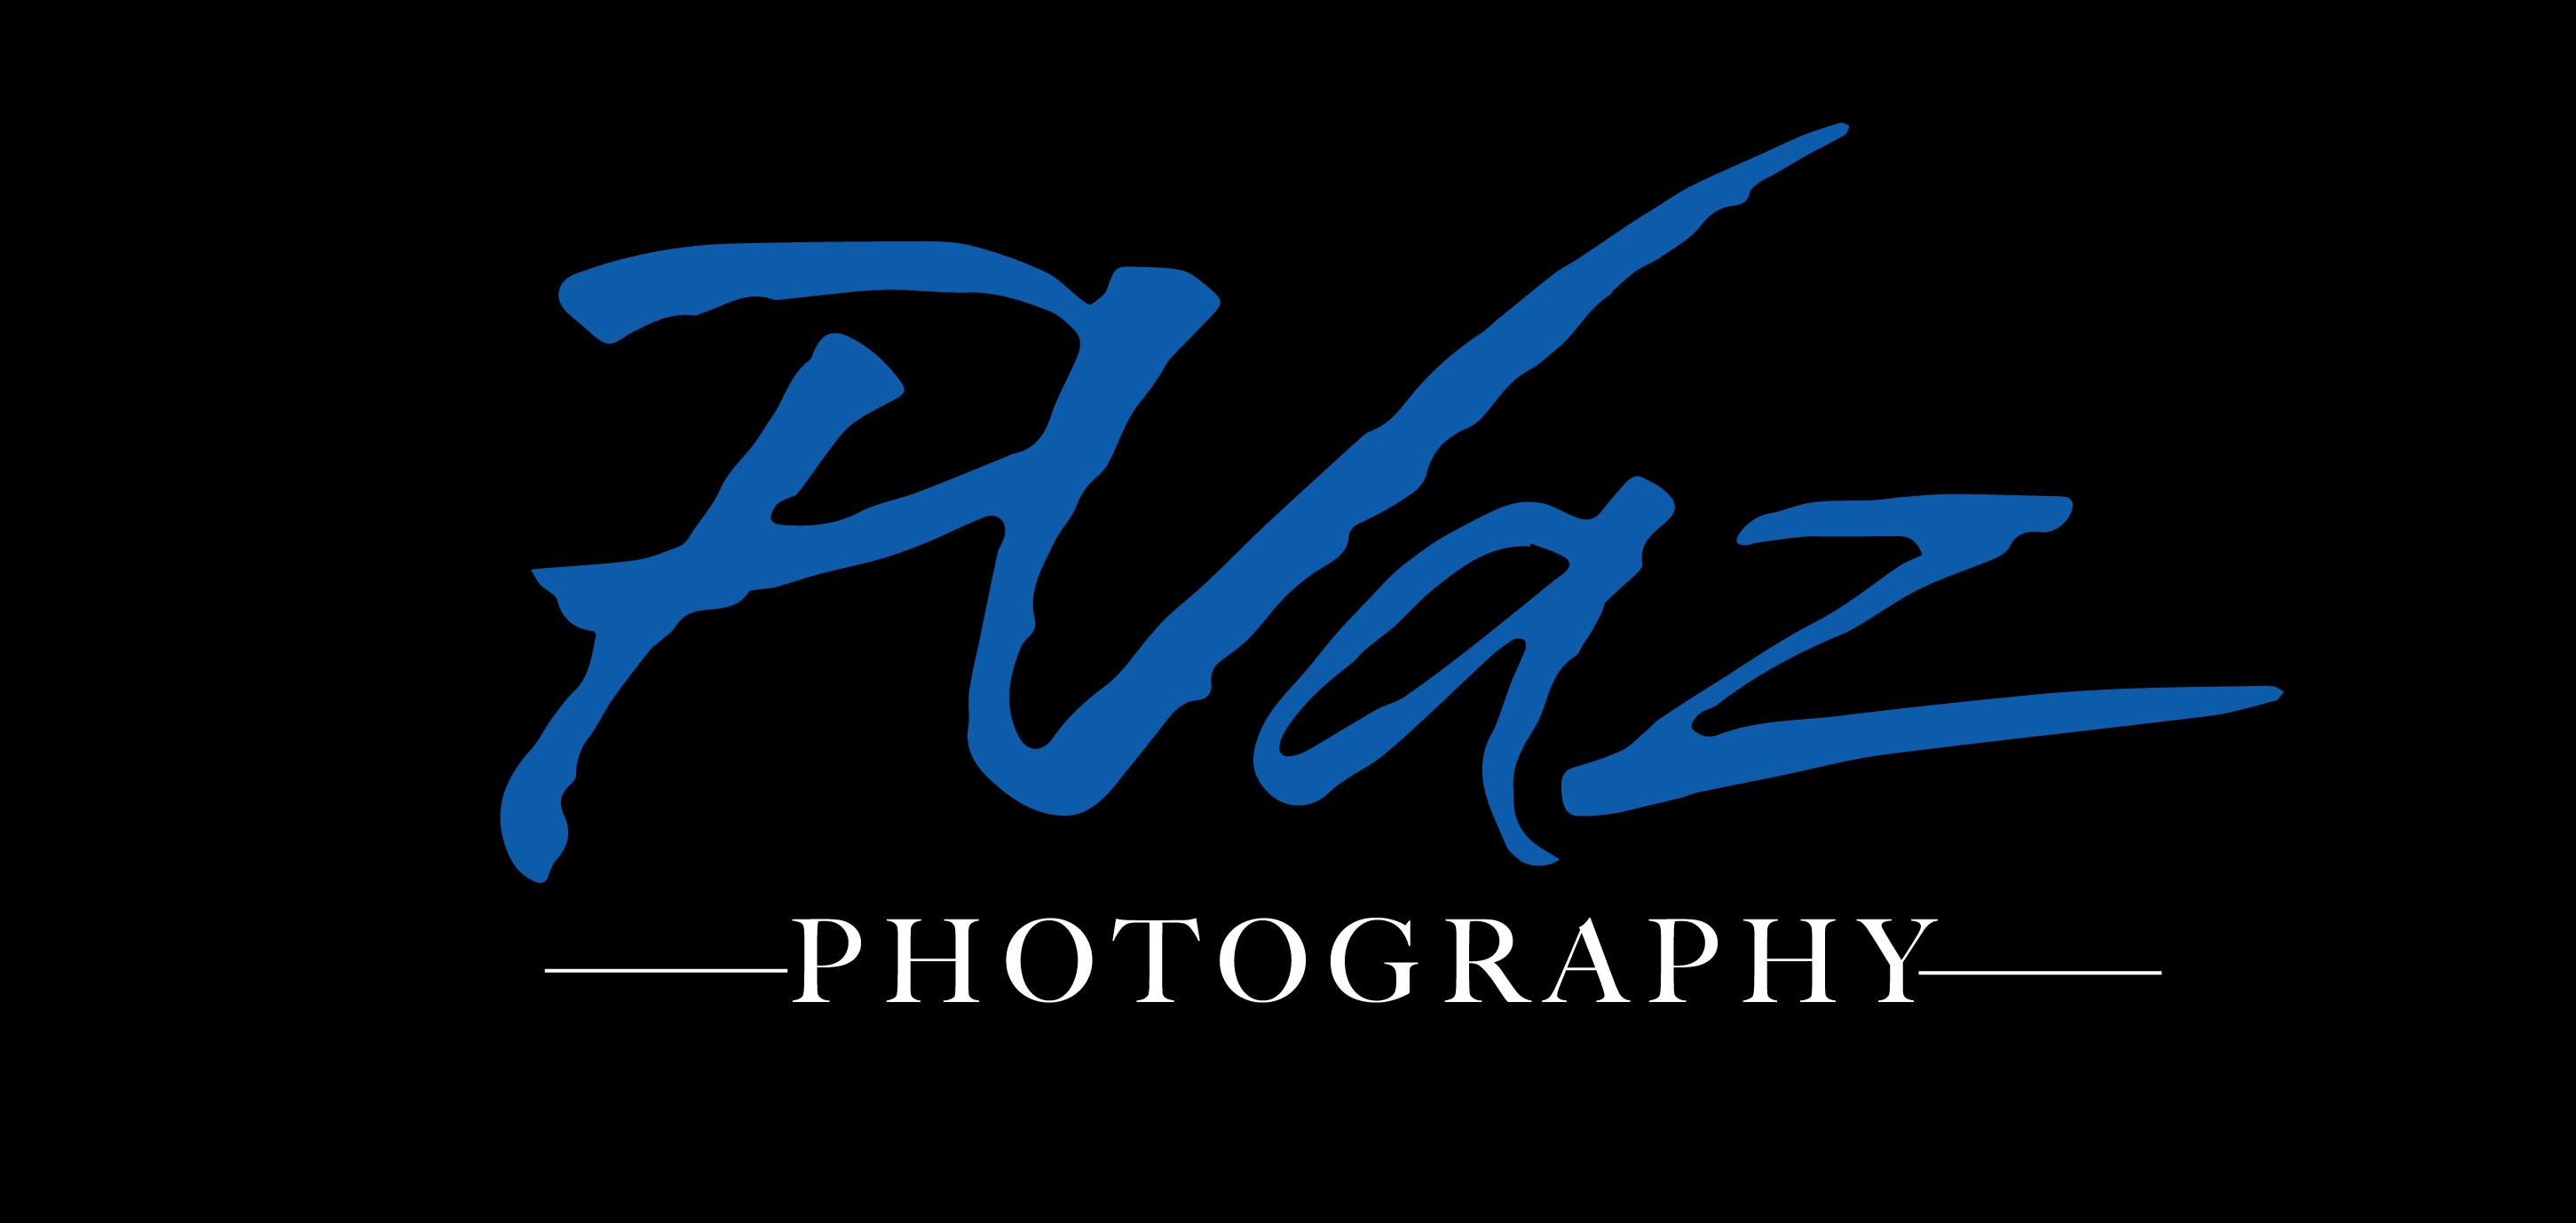 Pvaz Photography Logo